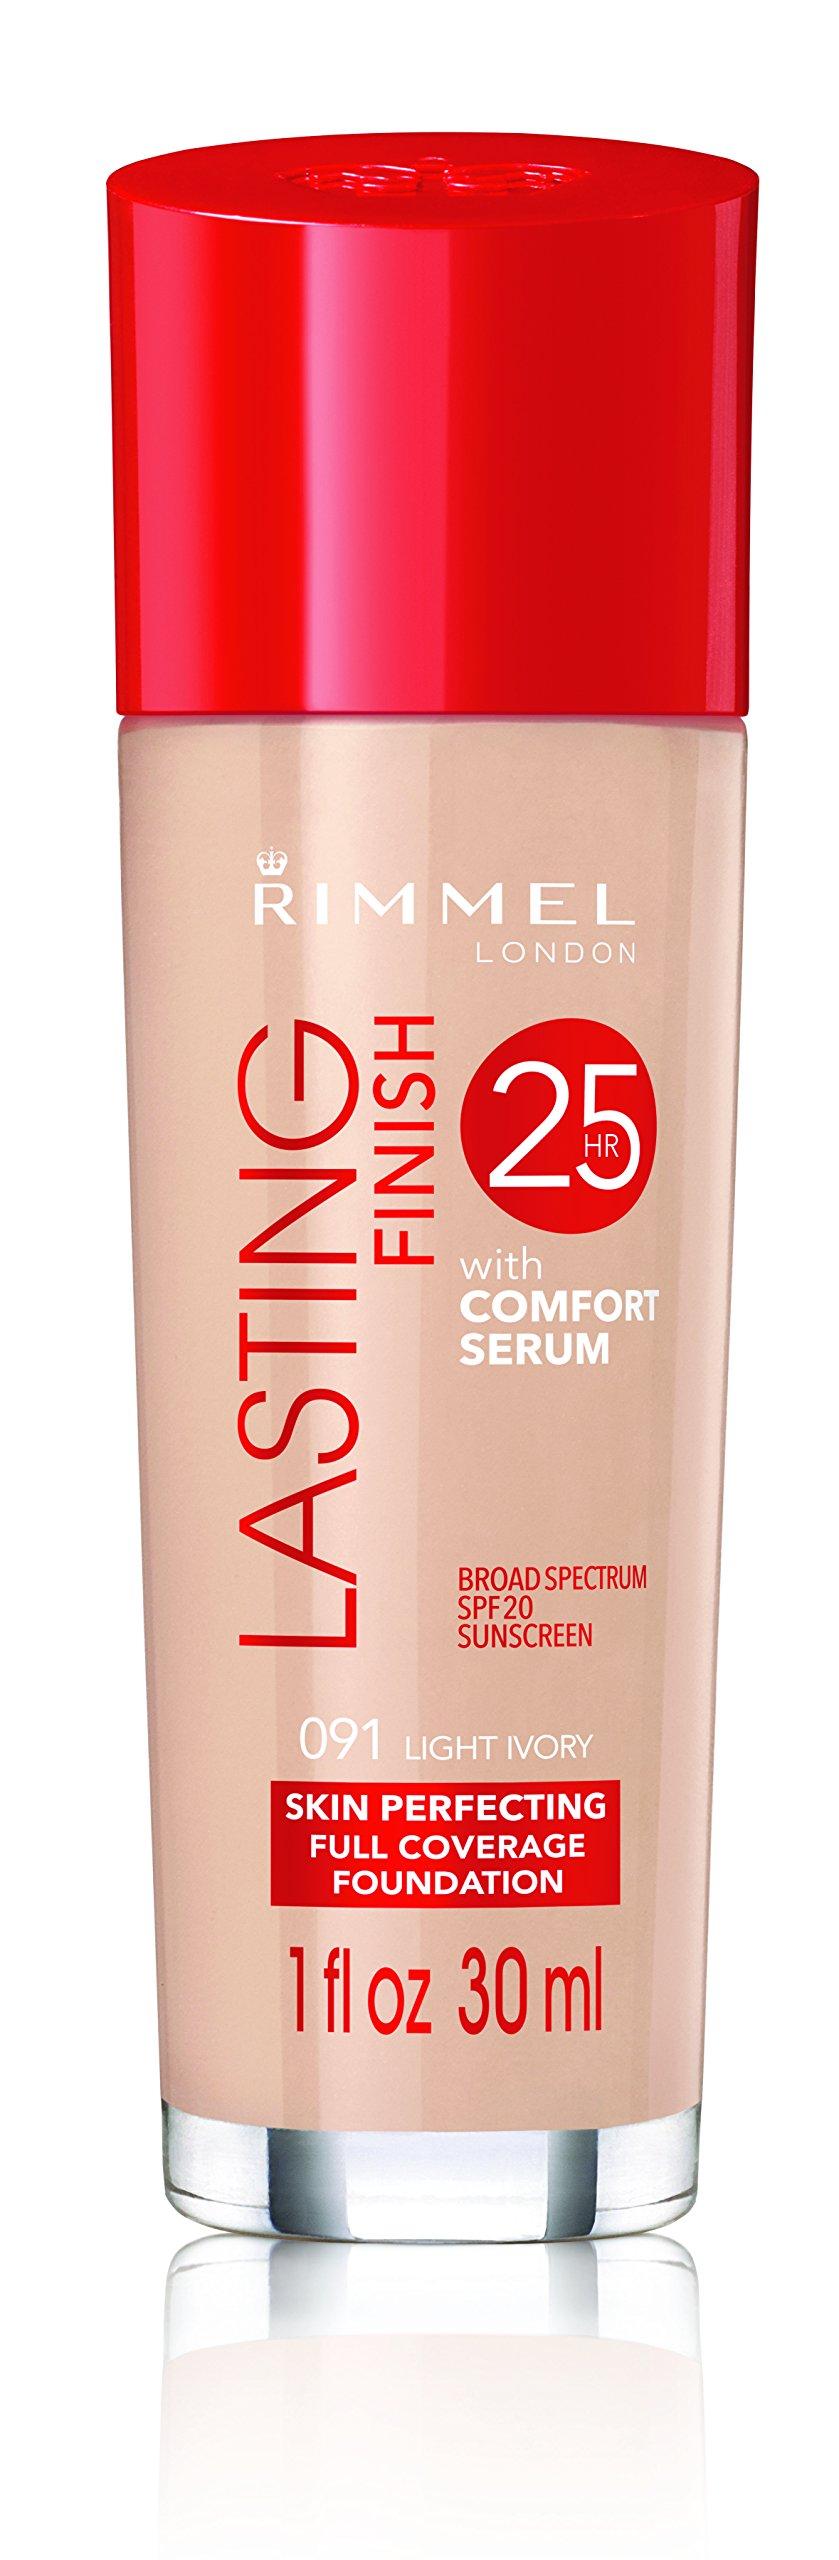 Rimmel Lasting Finish Foundation, Light Ivory, 1 oz., Medium Coverage Liquid Foundation with SPF 20, Long Lasting Smooth & Even Look